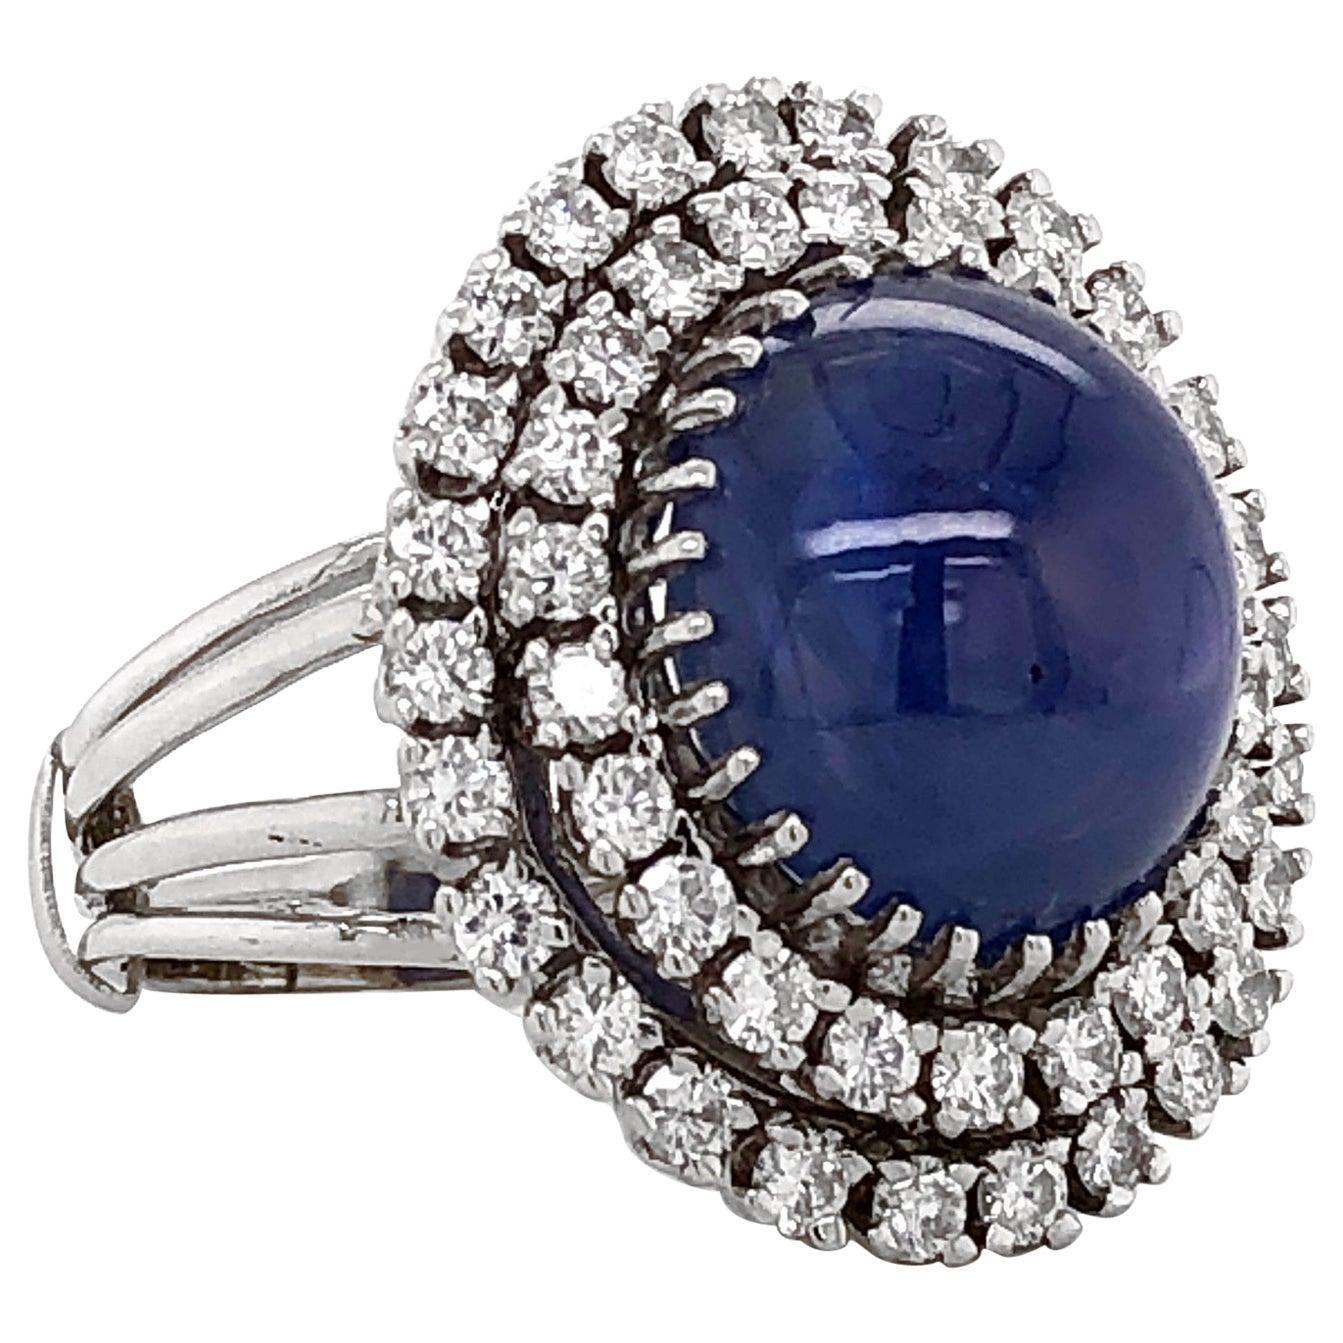 Certified Ceylon Sapphire 30 Carat Cabochon Diamond Platinum Cocktail Ring